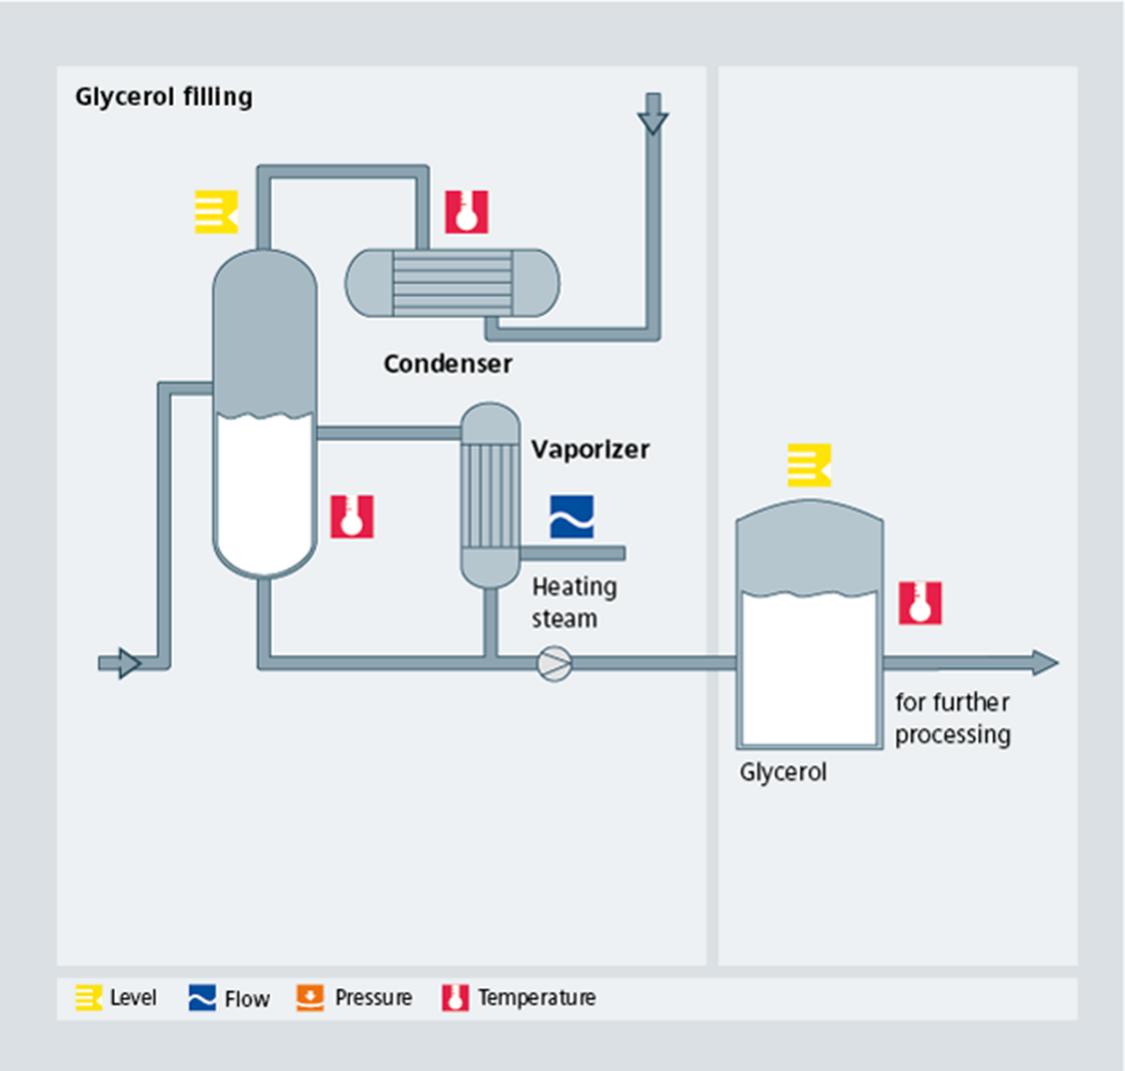 Biodiesel Glycerol Filling process diagram - Siemens USA